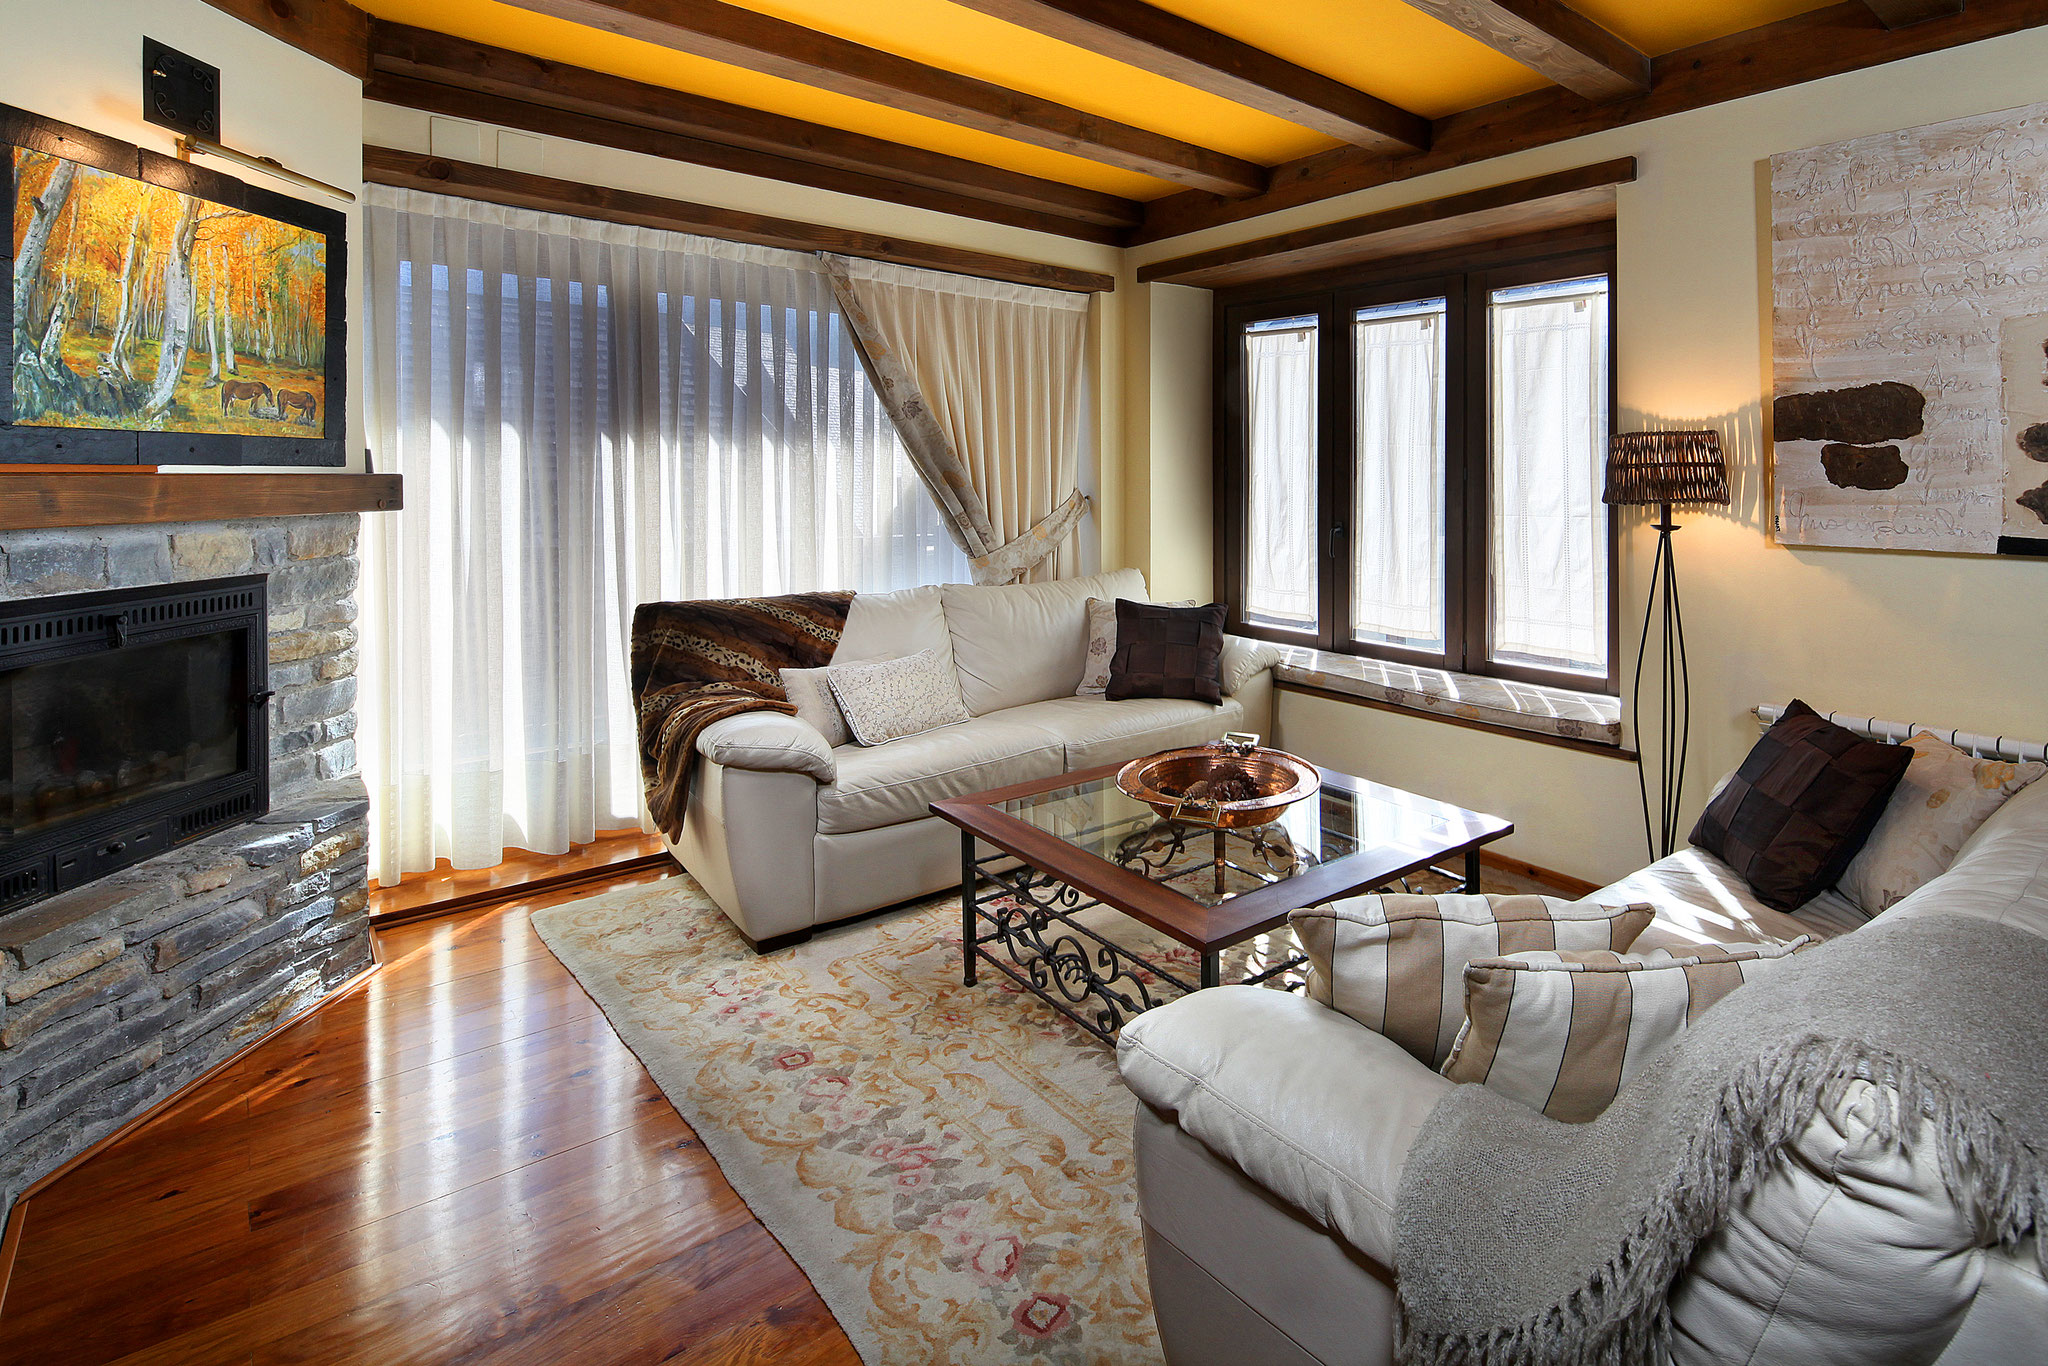 Apartamento Amets de Aran - Gausac - Vielha e Mijaran